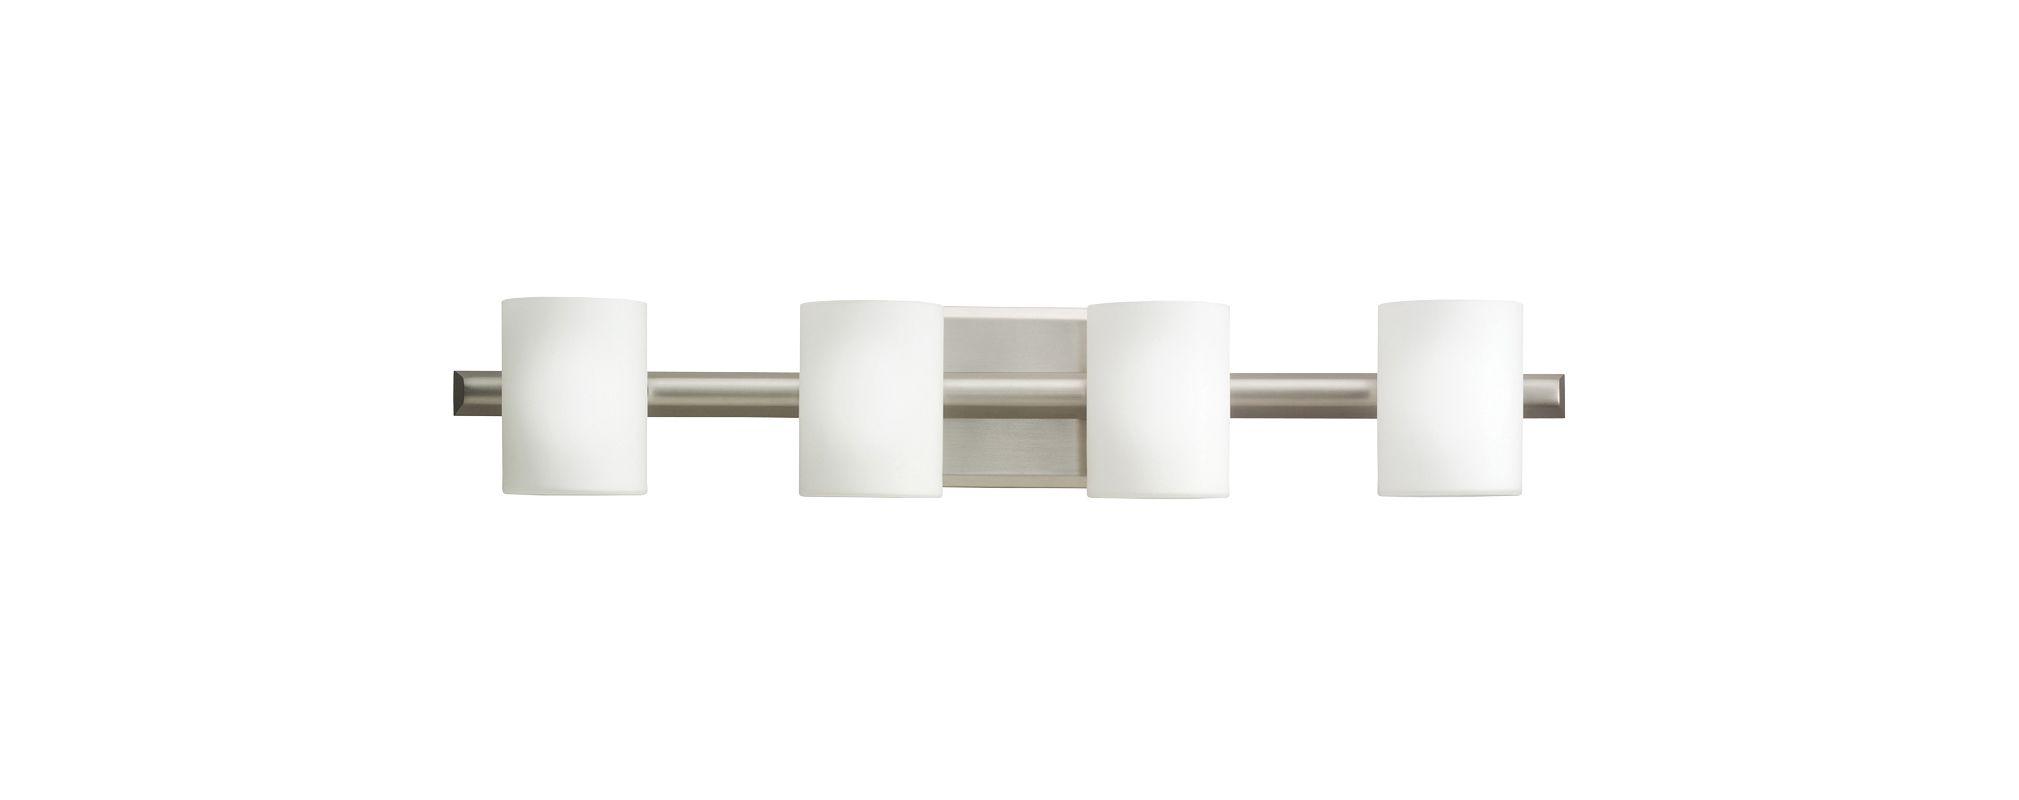 "Kichler 5968 Tubes 28"" Wide 4-Bulb Bathroom Lighting Fixture Brushed"